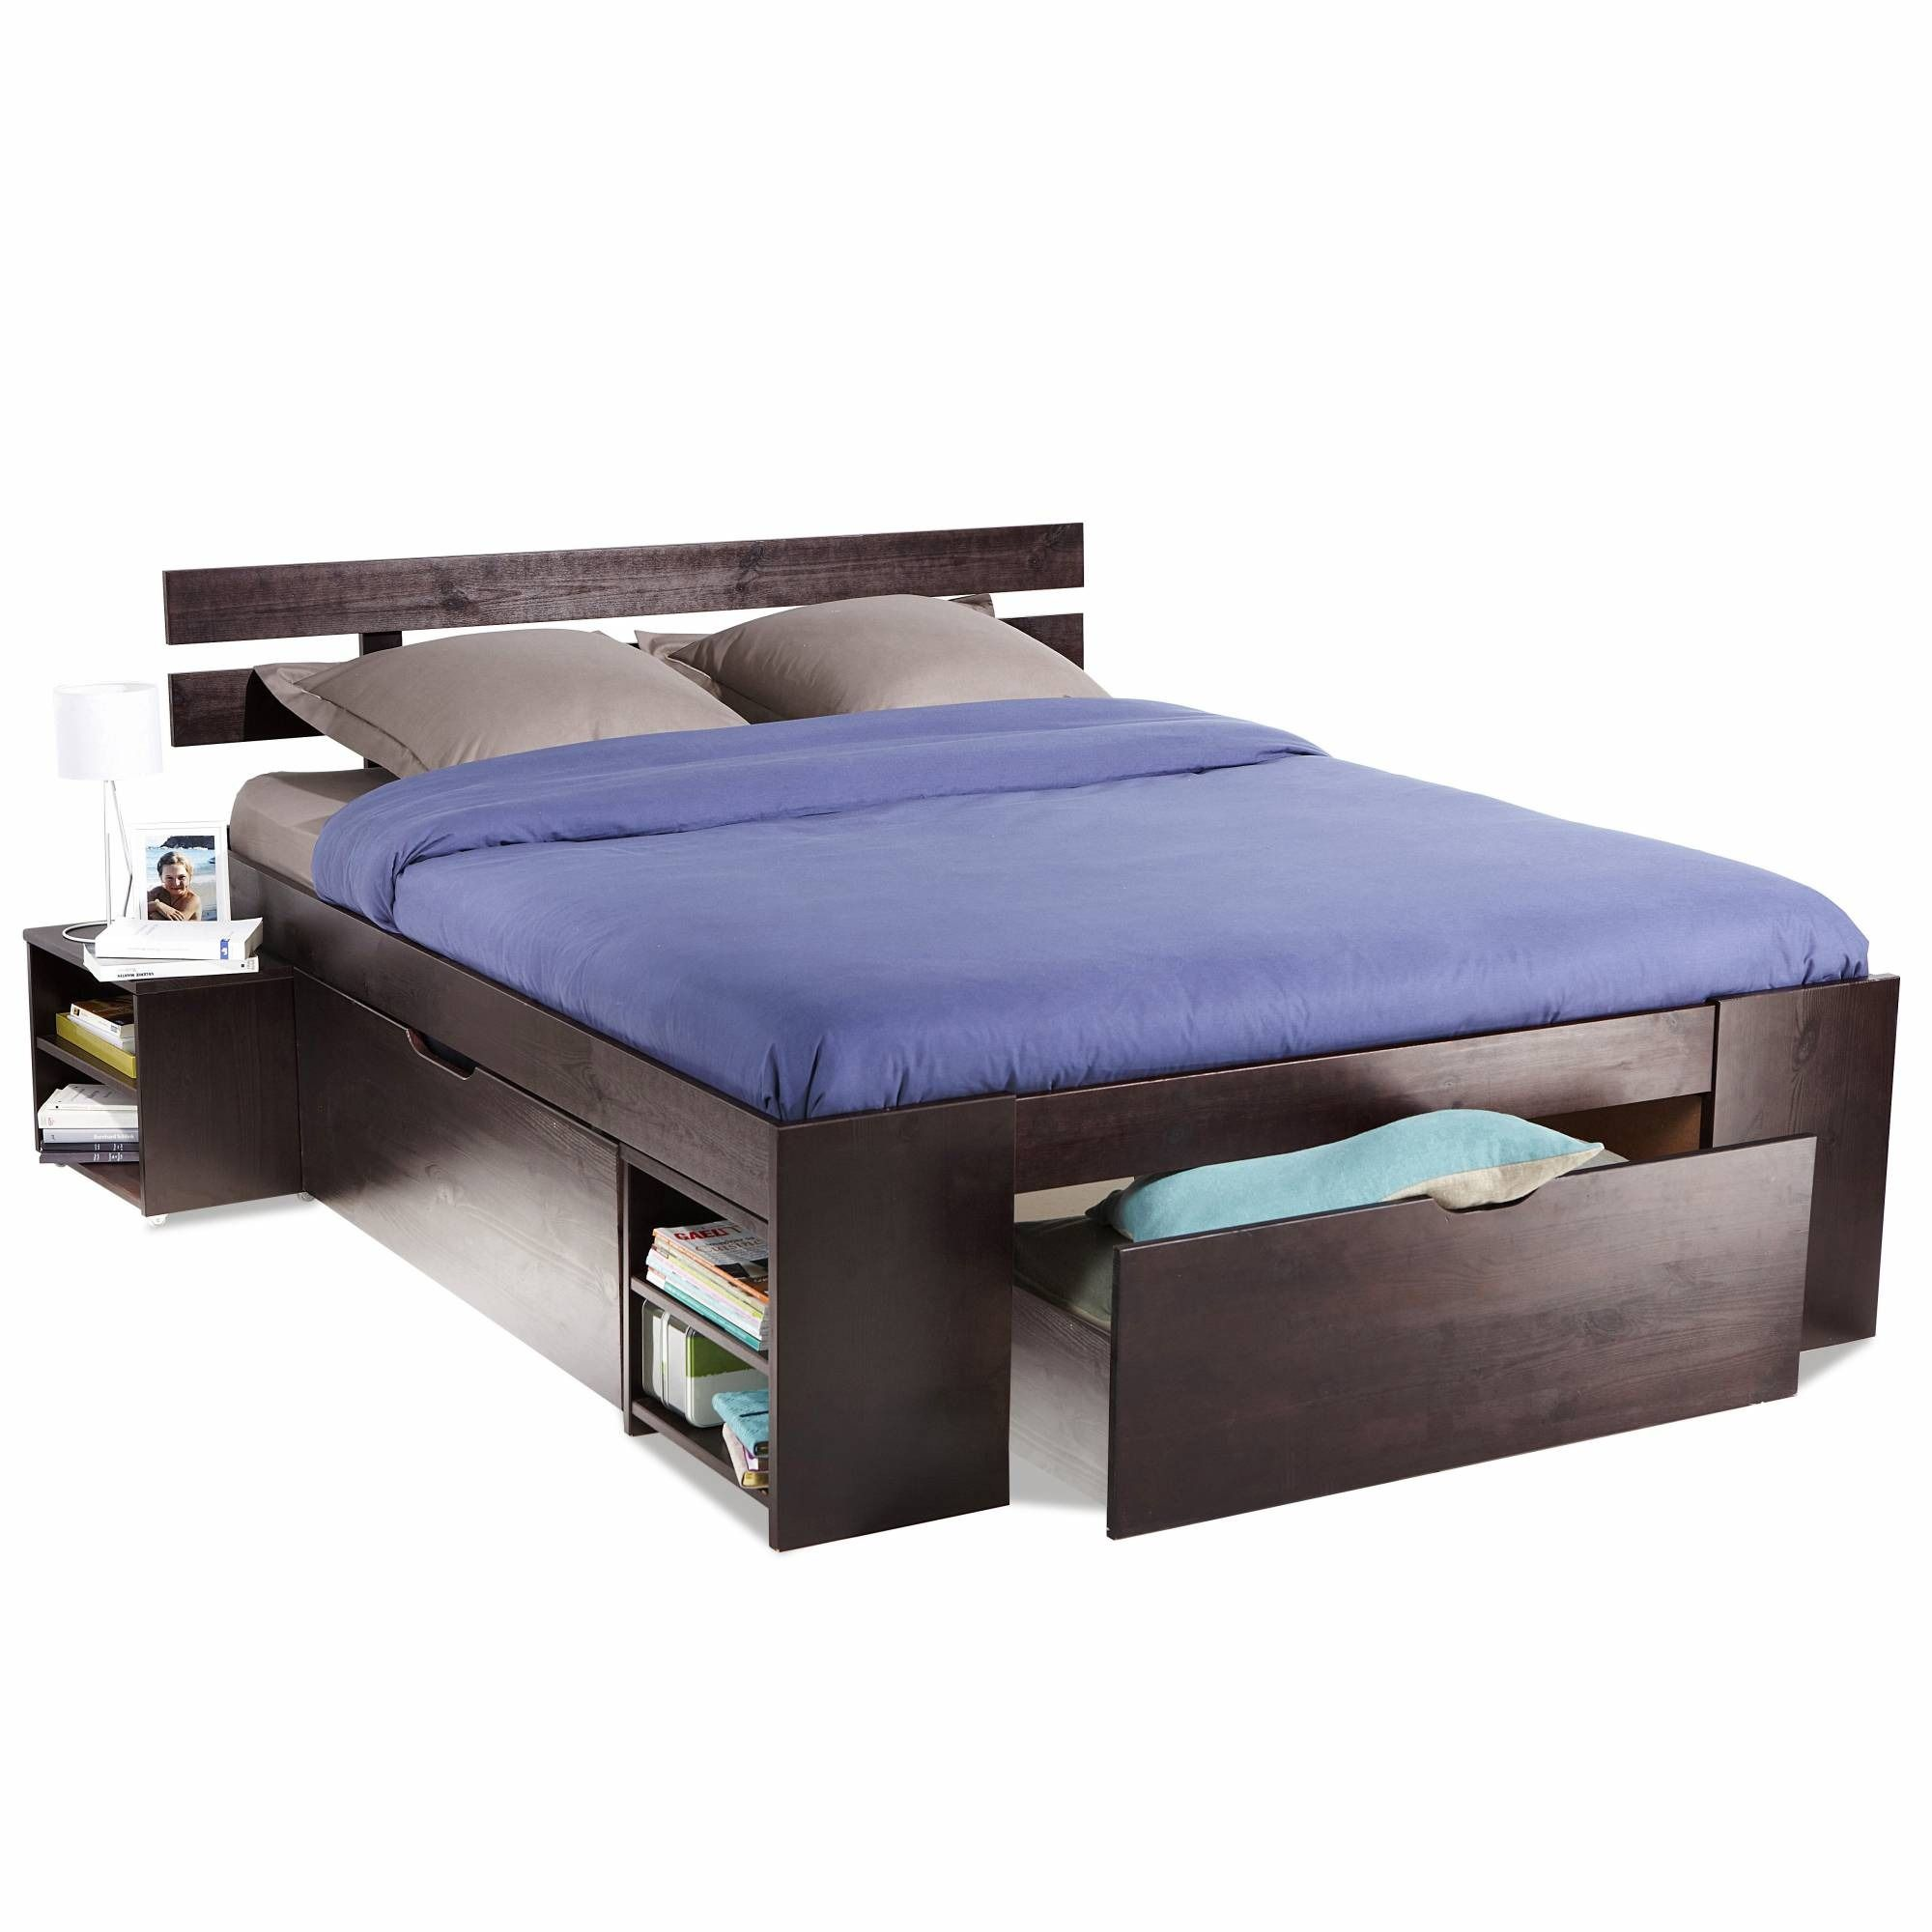 lit gain de place en pin massif certifi fsc 3 suisses. Black Bedroom Furniture Sets. Home Design Ideas